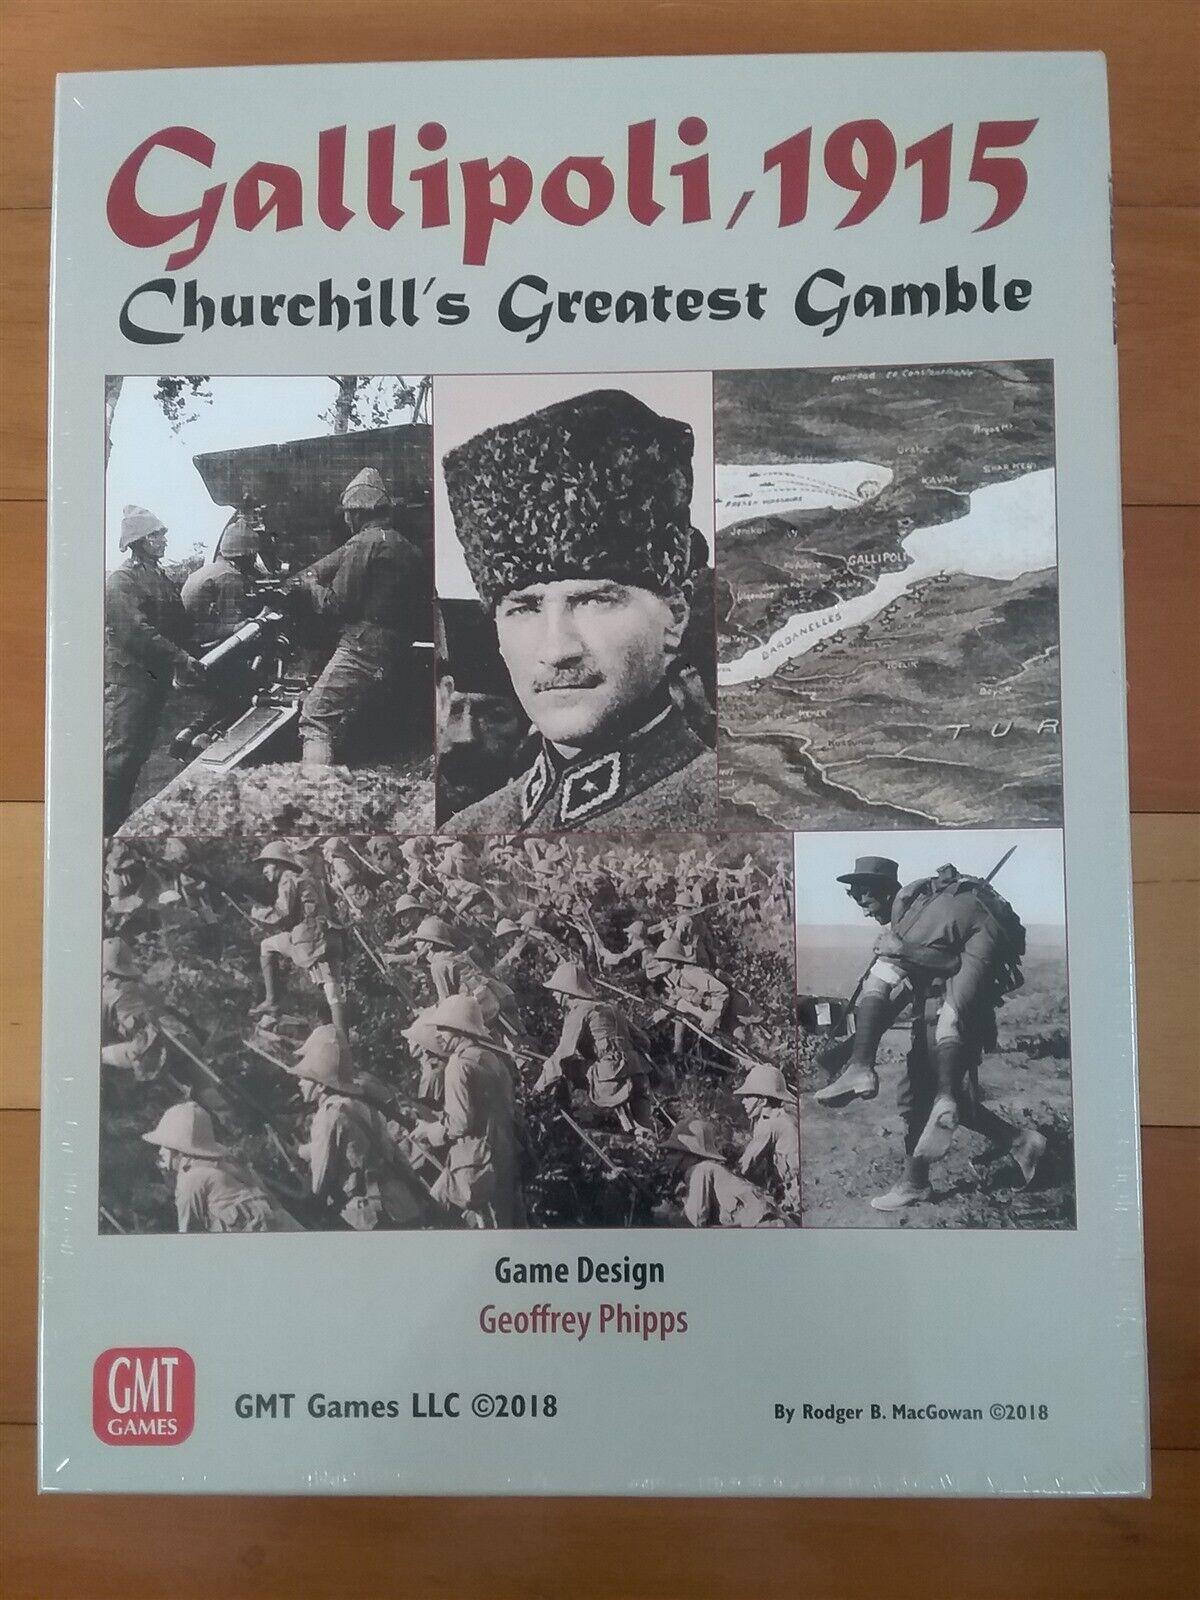 GMT spel Gallipoli, 1915